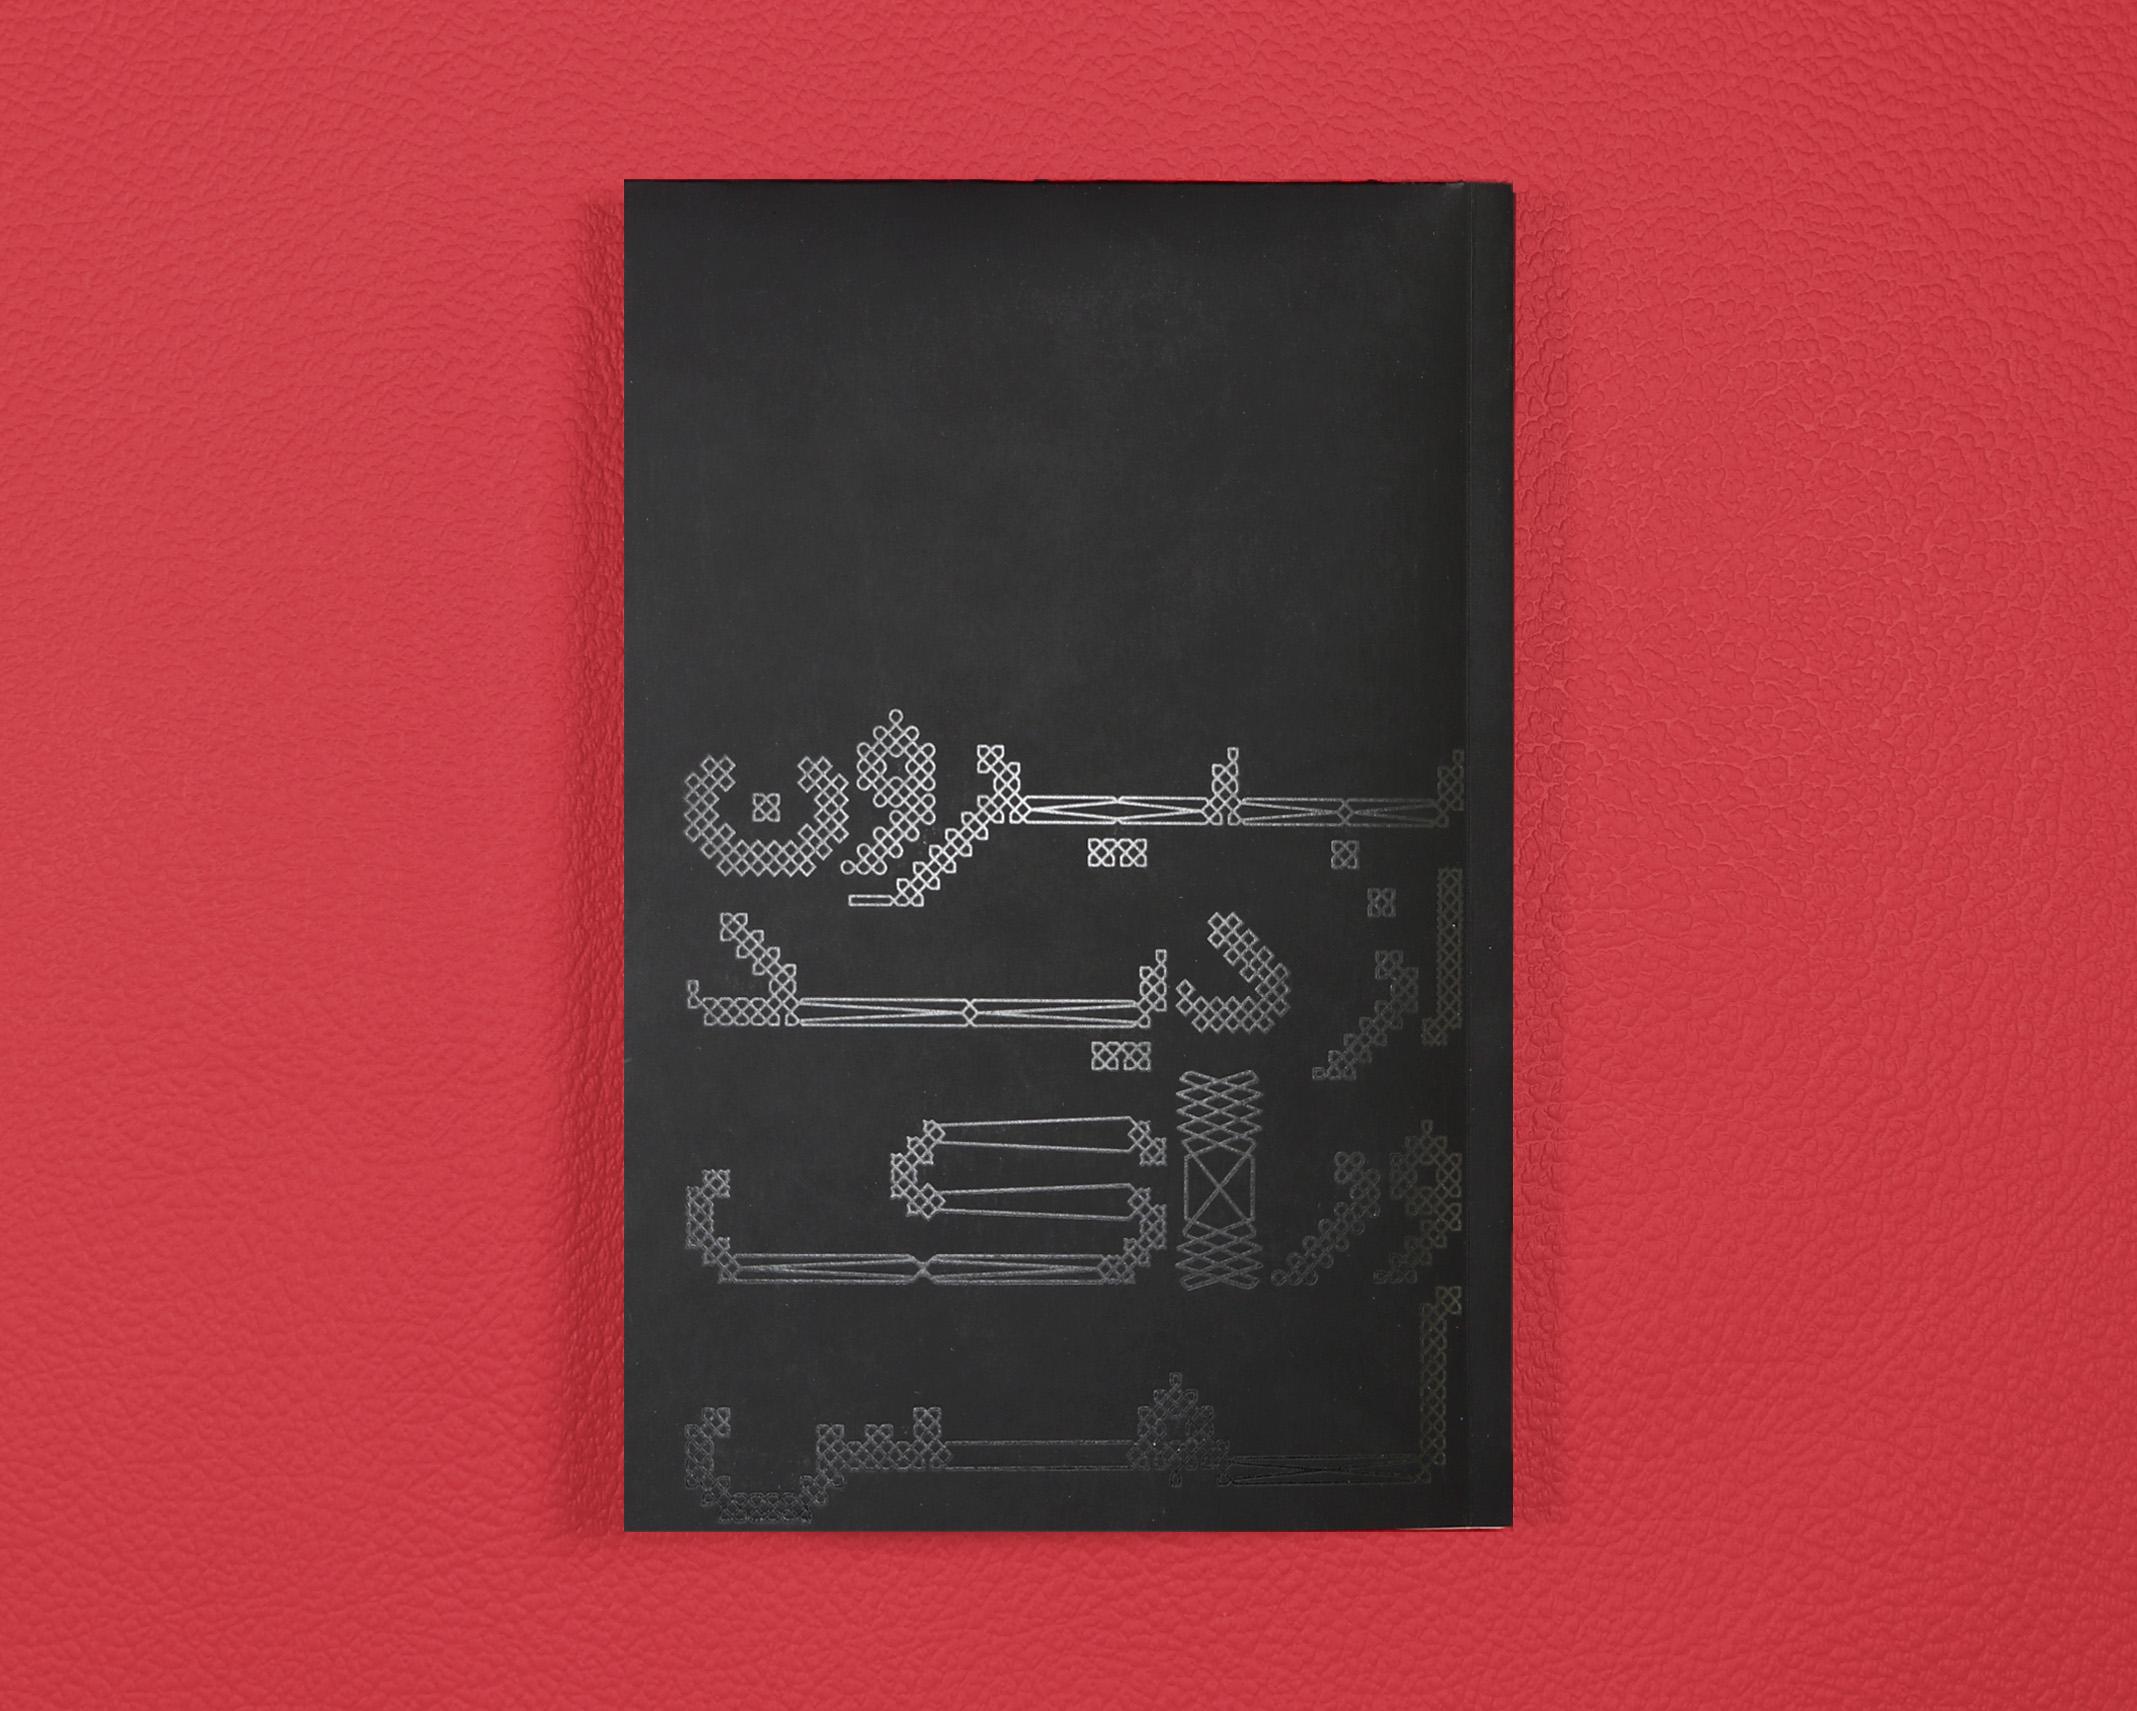 black book cover with black text in farsi